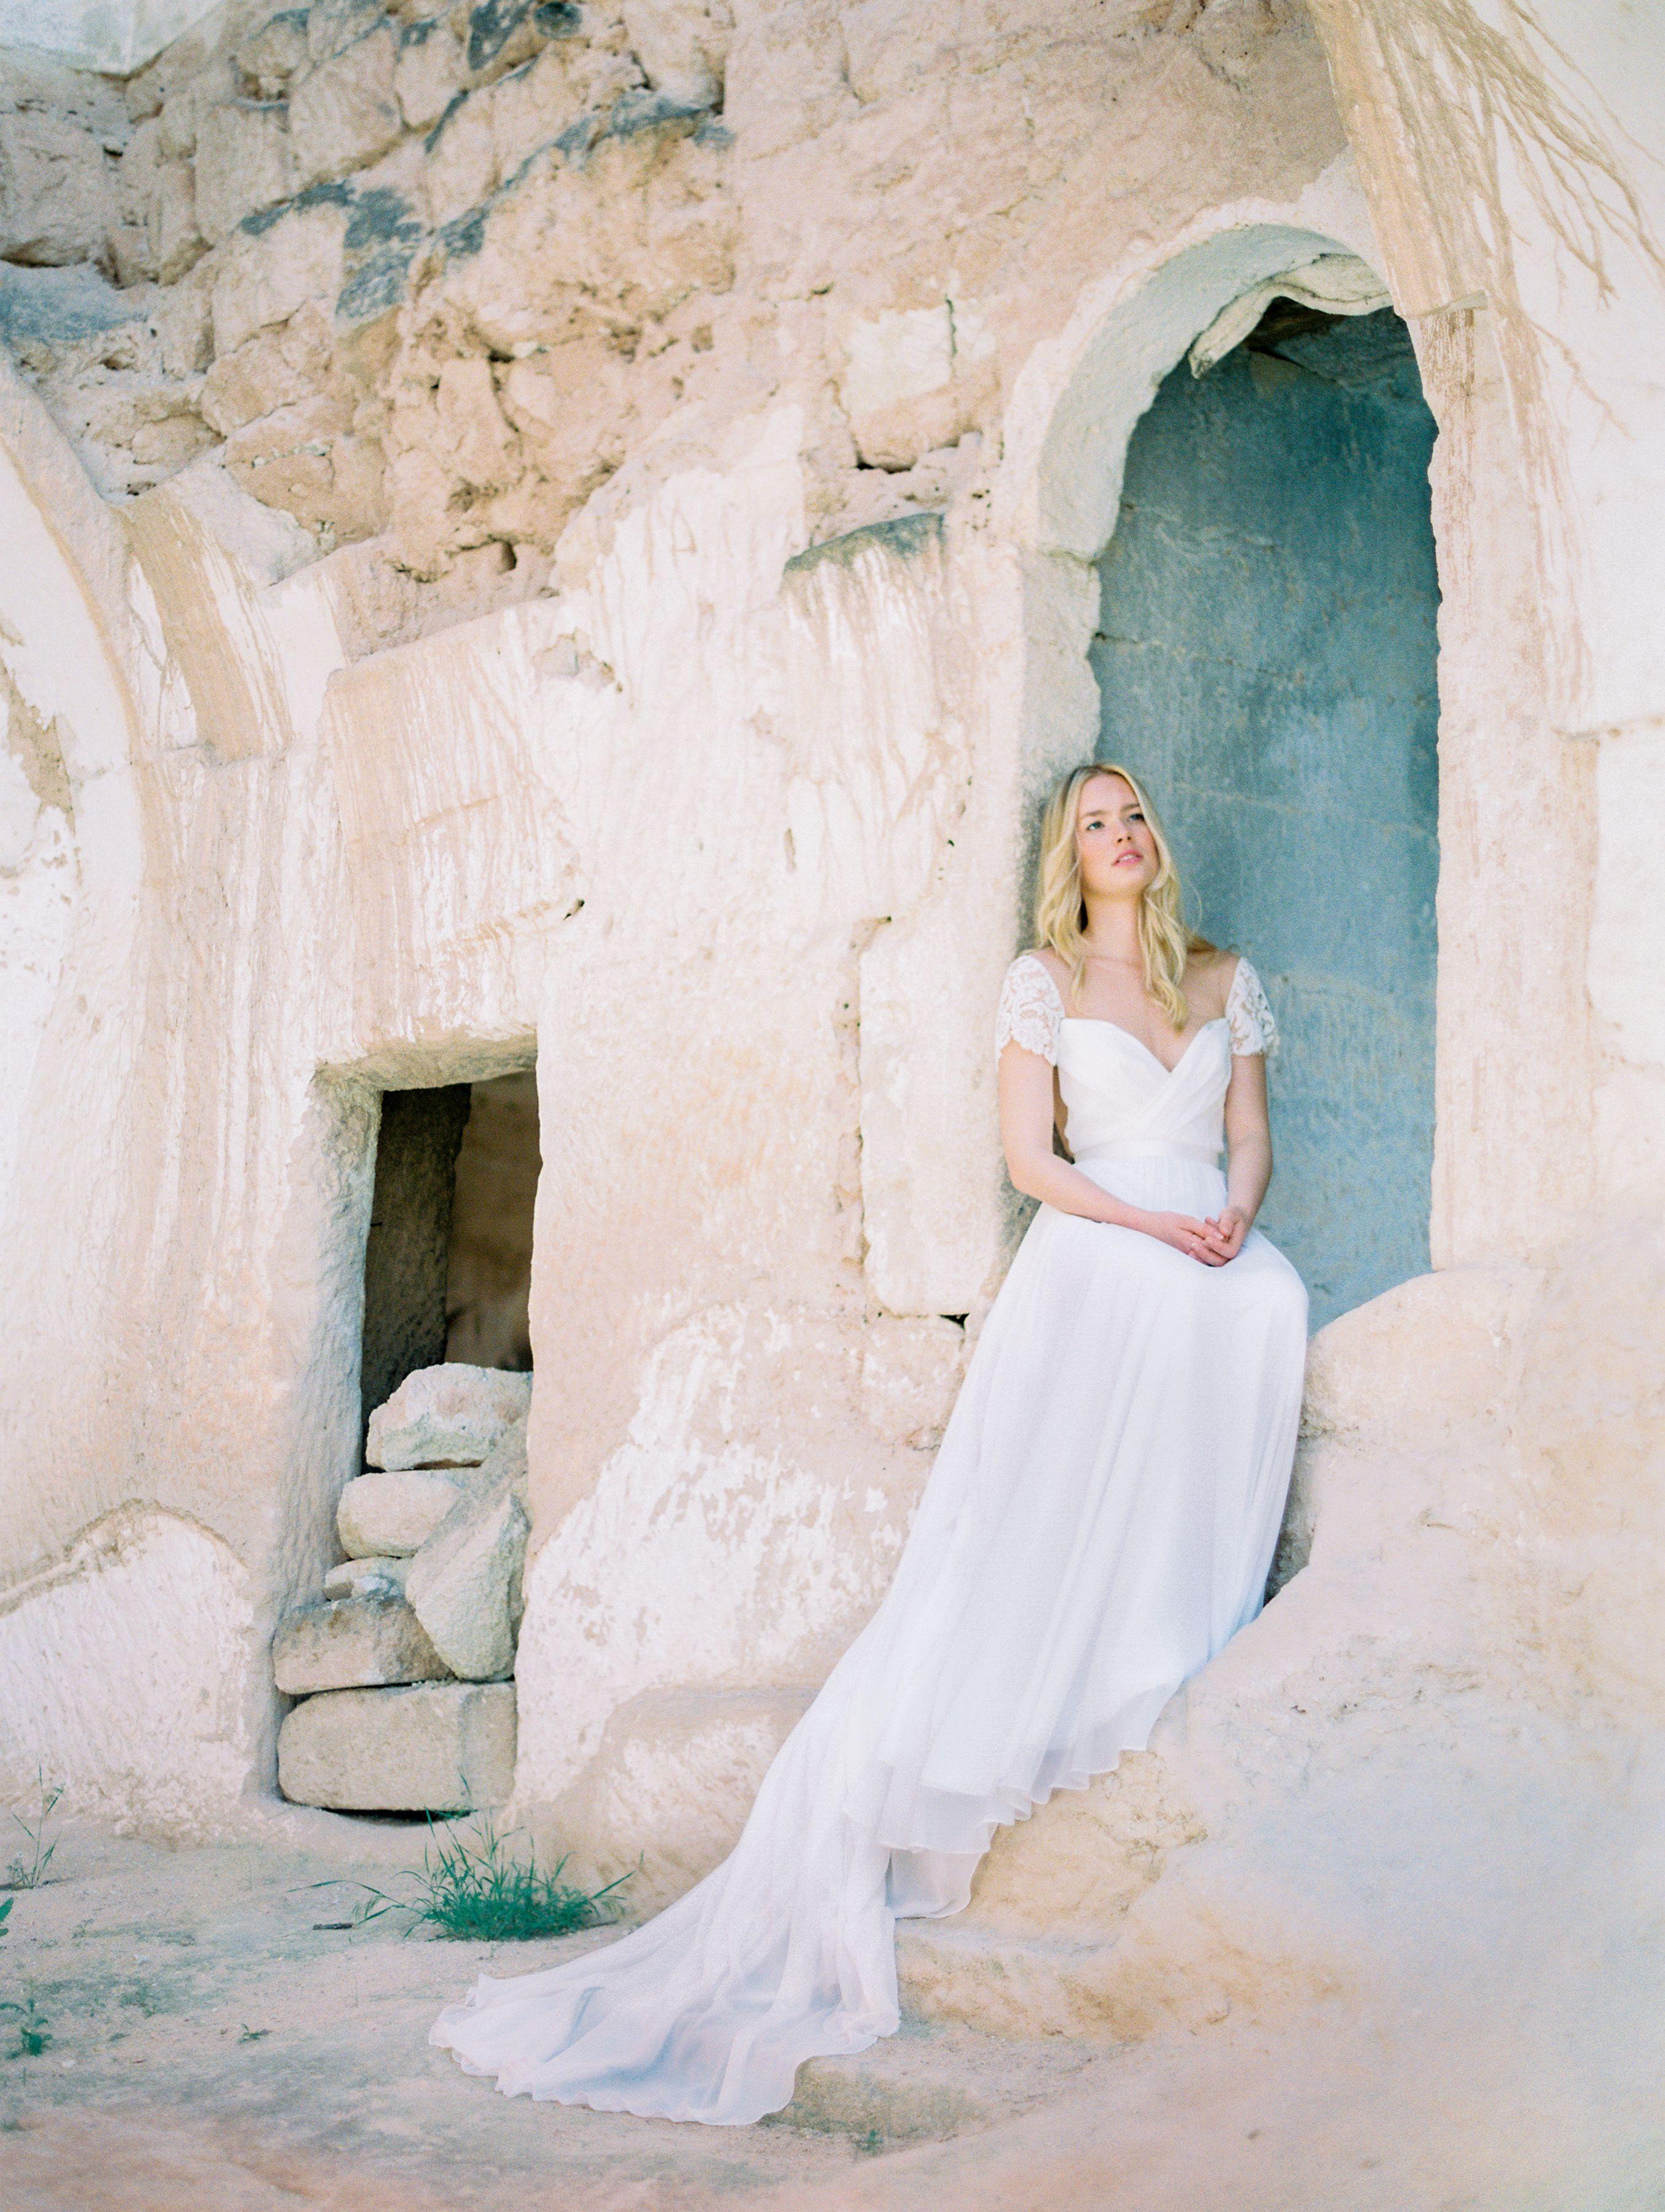 d84b0ed464b1 Truvelle | Mary | Try it on at Sash & Bustle #capsleeve  #illusionweddingdress #openback #romanticweddinggown #aline  #canadianbridaldesigner #romanticbride ...